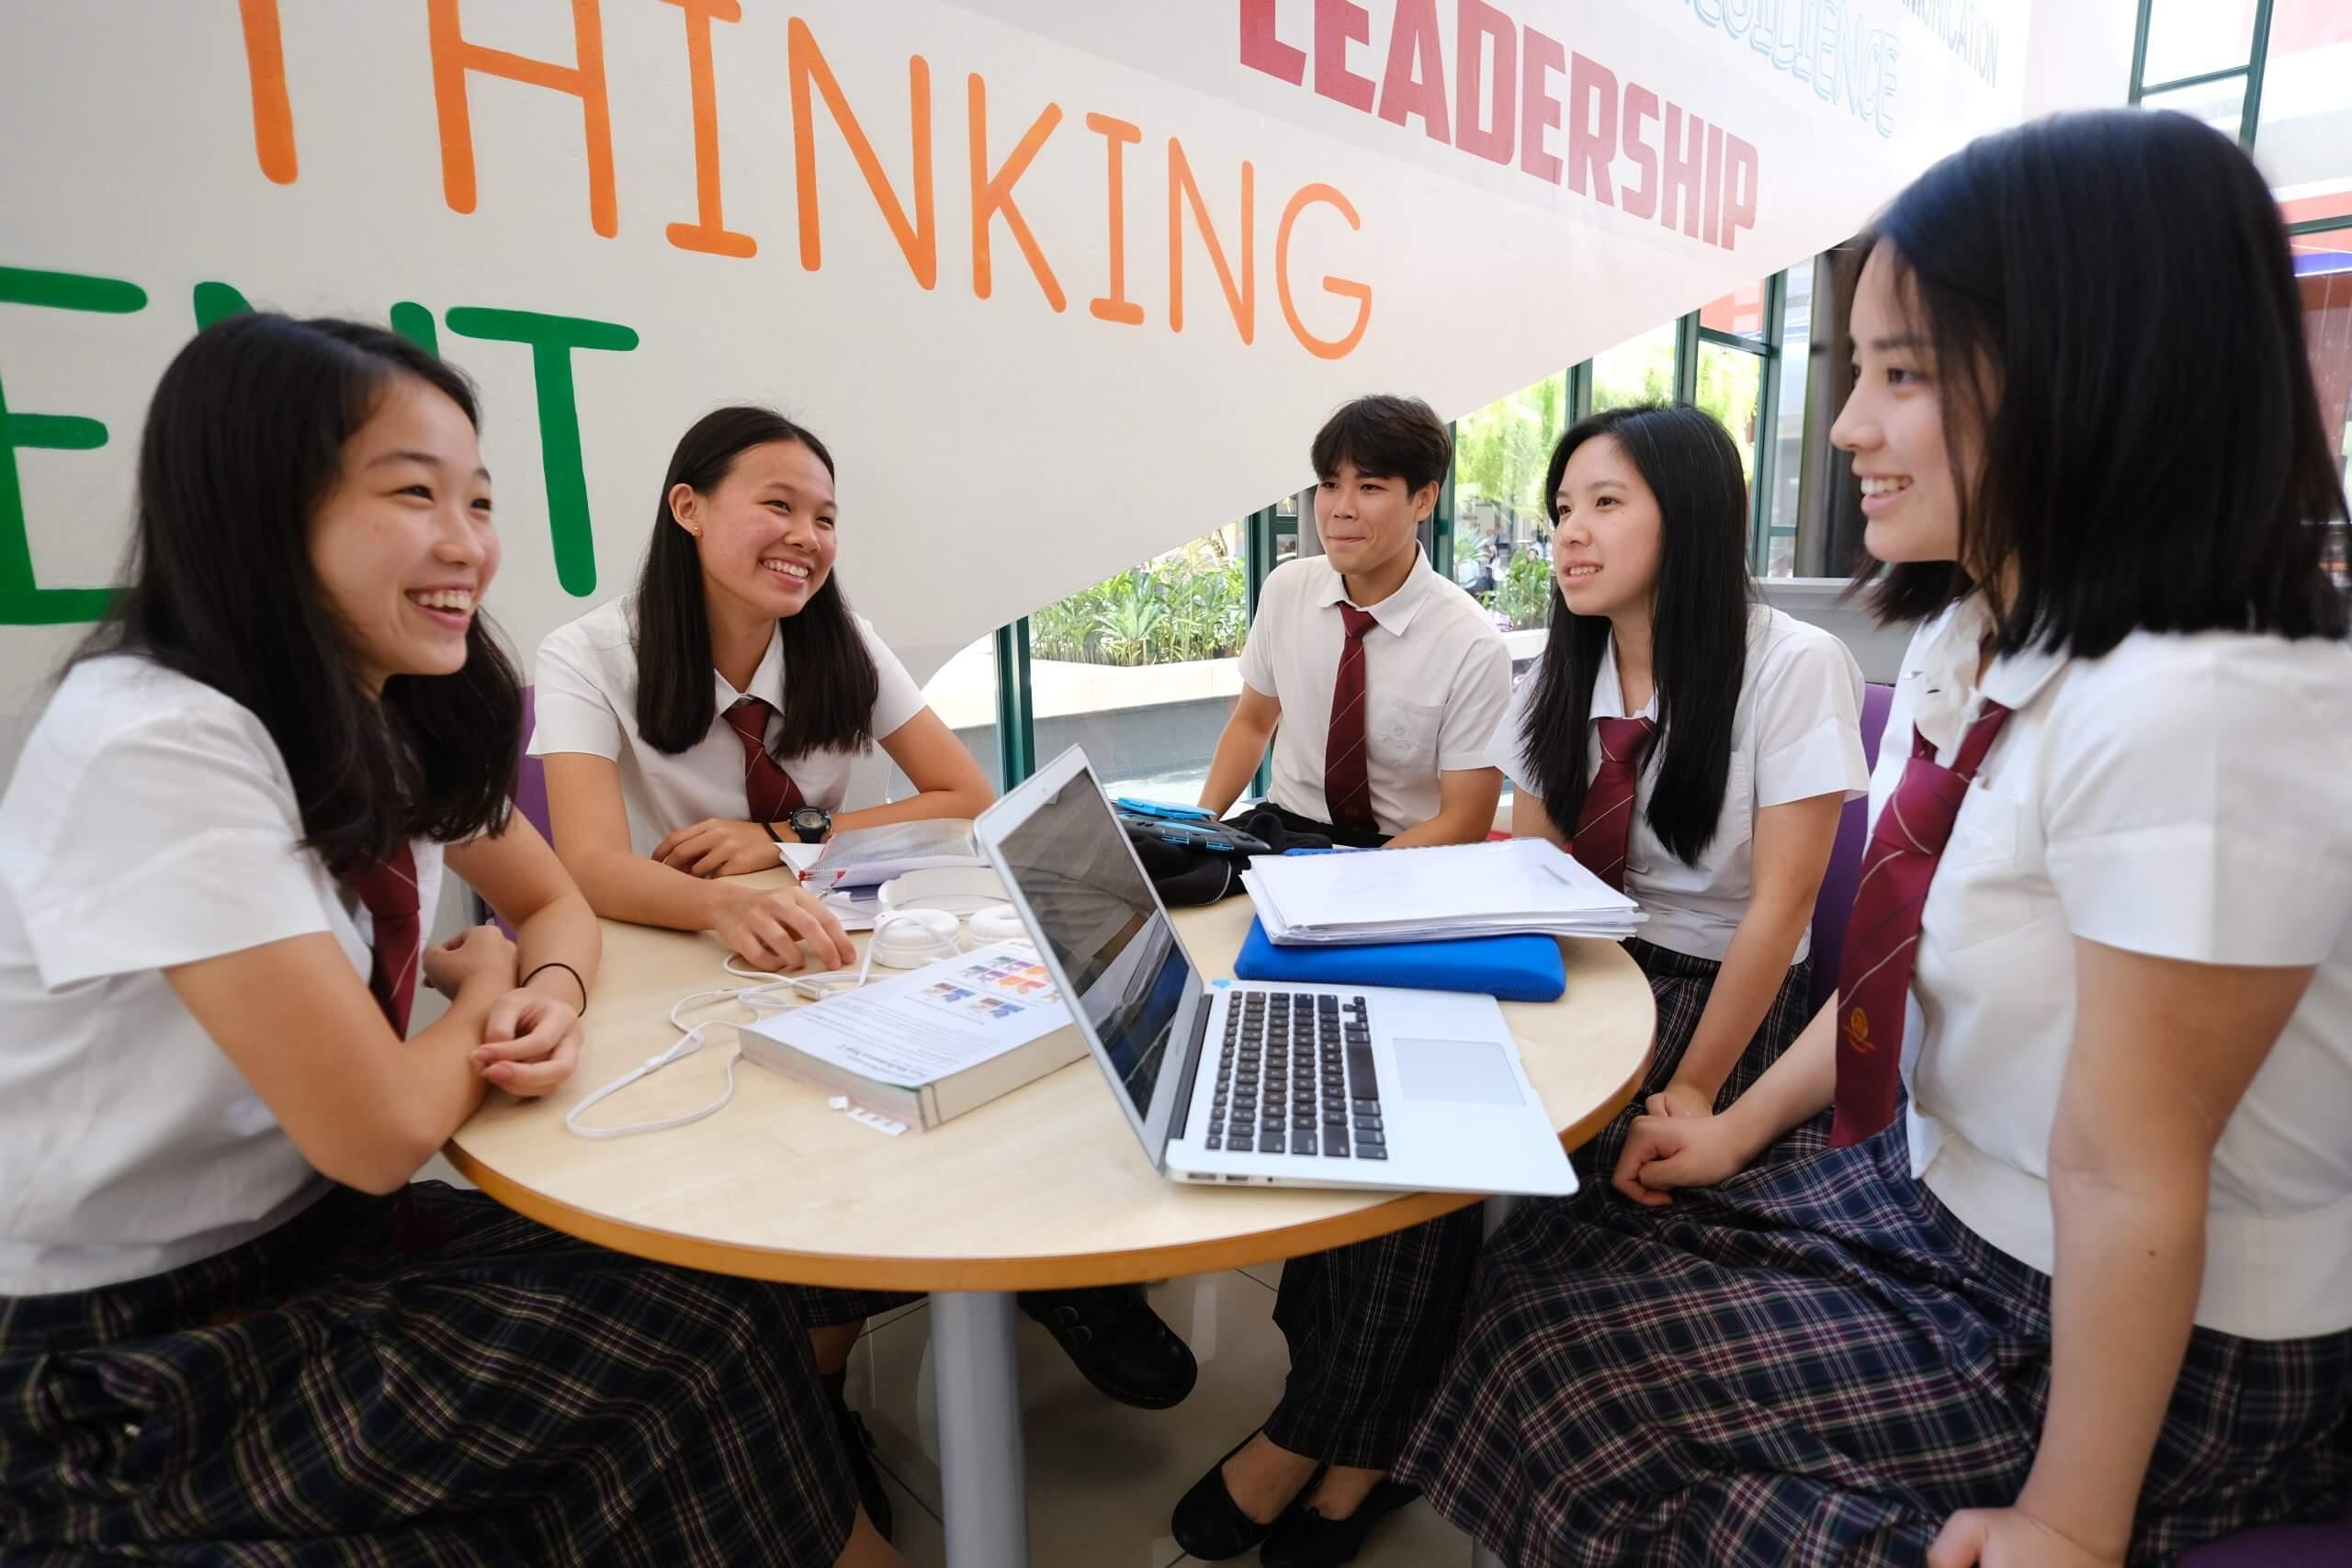 International schools in Asia